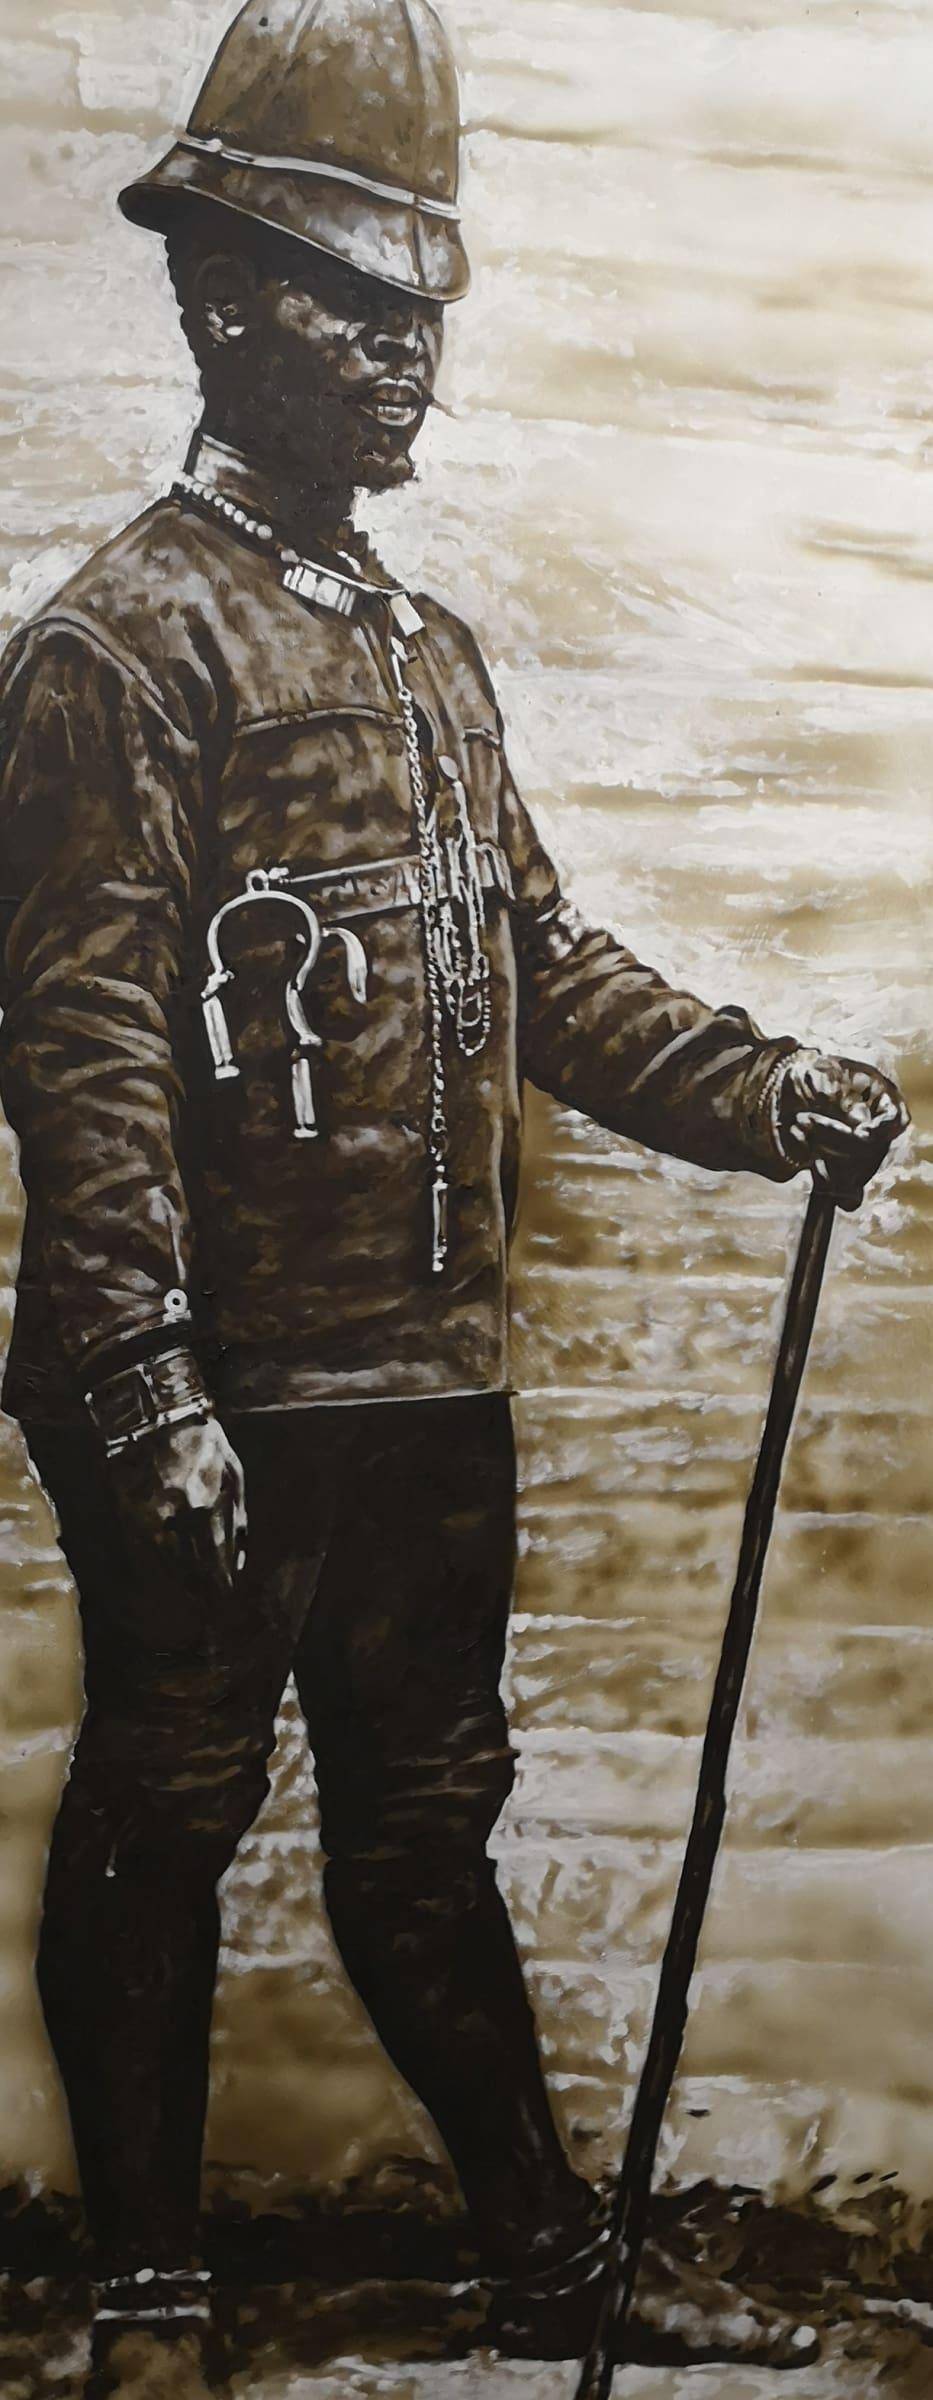 <span class=&#34;link fancybox-details-link&#34;><a href=&#34;/artists/73-sascha-%26-tashi-stylianou/works/3175-sascha-tashi-stylianou-black-bobbie-1-2015/&#34;>View Detail Page</a></span><div class=&#34;artist&#34;><strong>Sascha & Tashi Stylianou</strong></div> <div class=&#34;title&#34;><em>Black Bobbie 1</em>, 2015</div> <div class=&#34;medium&#34;>Oils & Acrylic Spray On Reclaimed Door </div> <div class=&#34;dimensions&#34;>202cm x 81cm x 4cm</div><div class=&#34;price&#34;>R10,000.00</div>